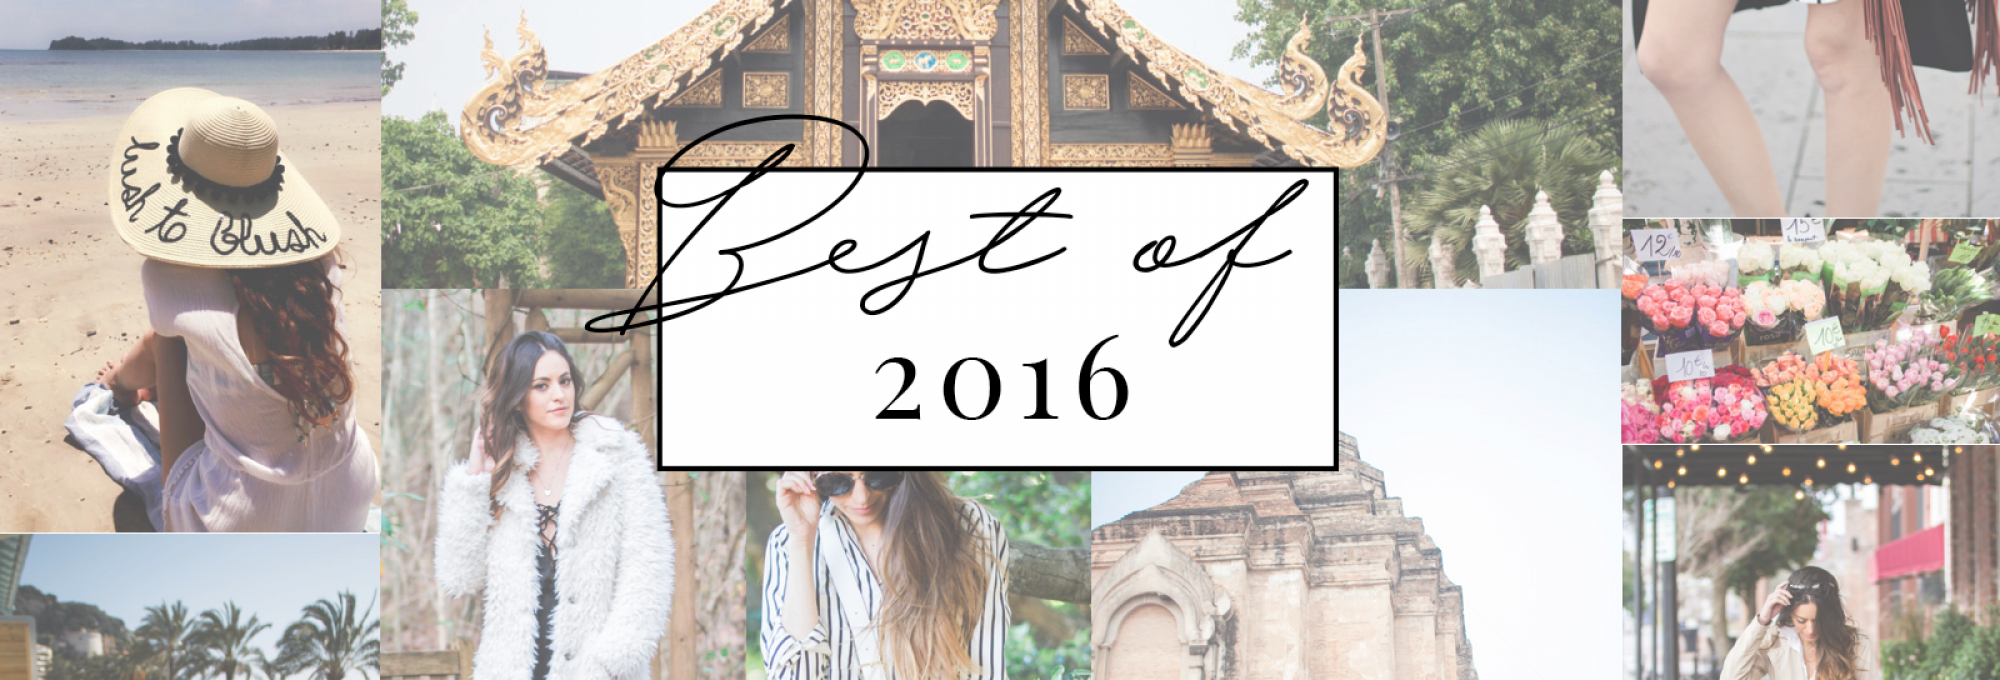 best of 2016, reader feedback survey